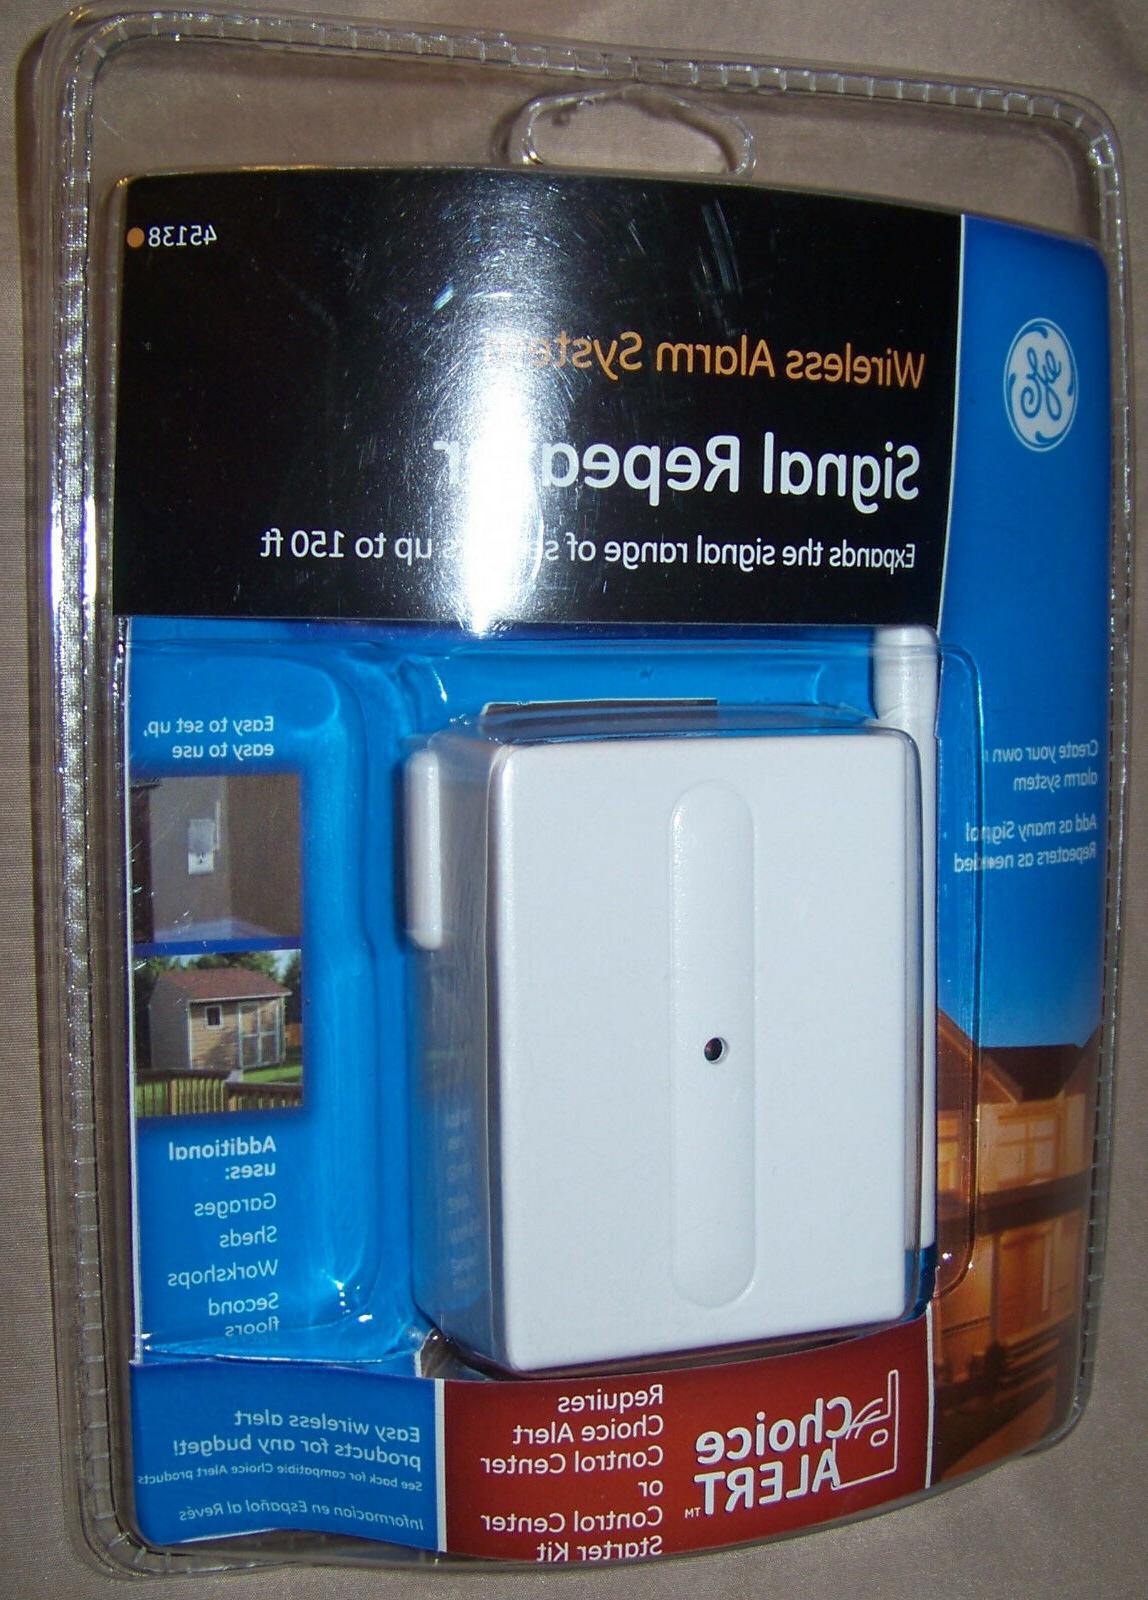 new choice alert wireless alarm system signal